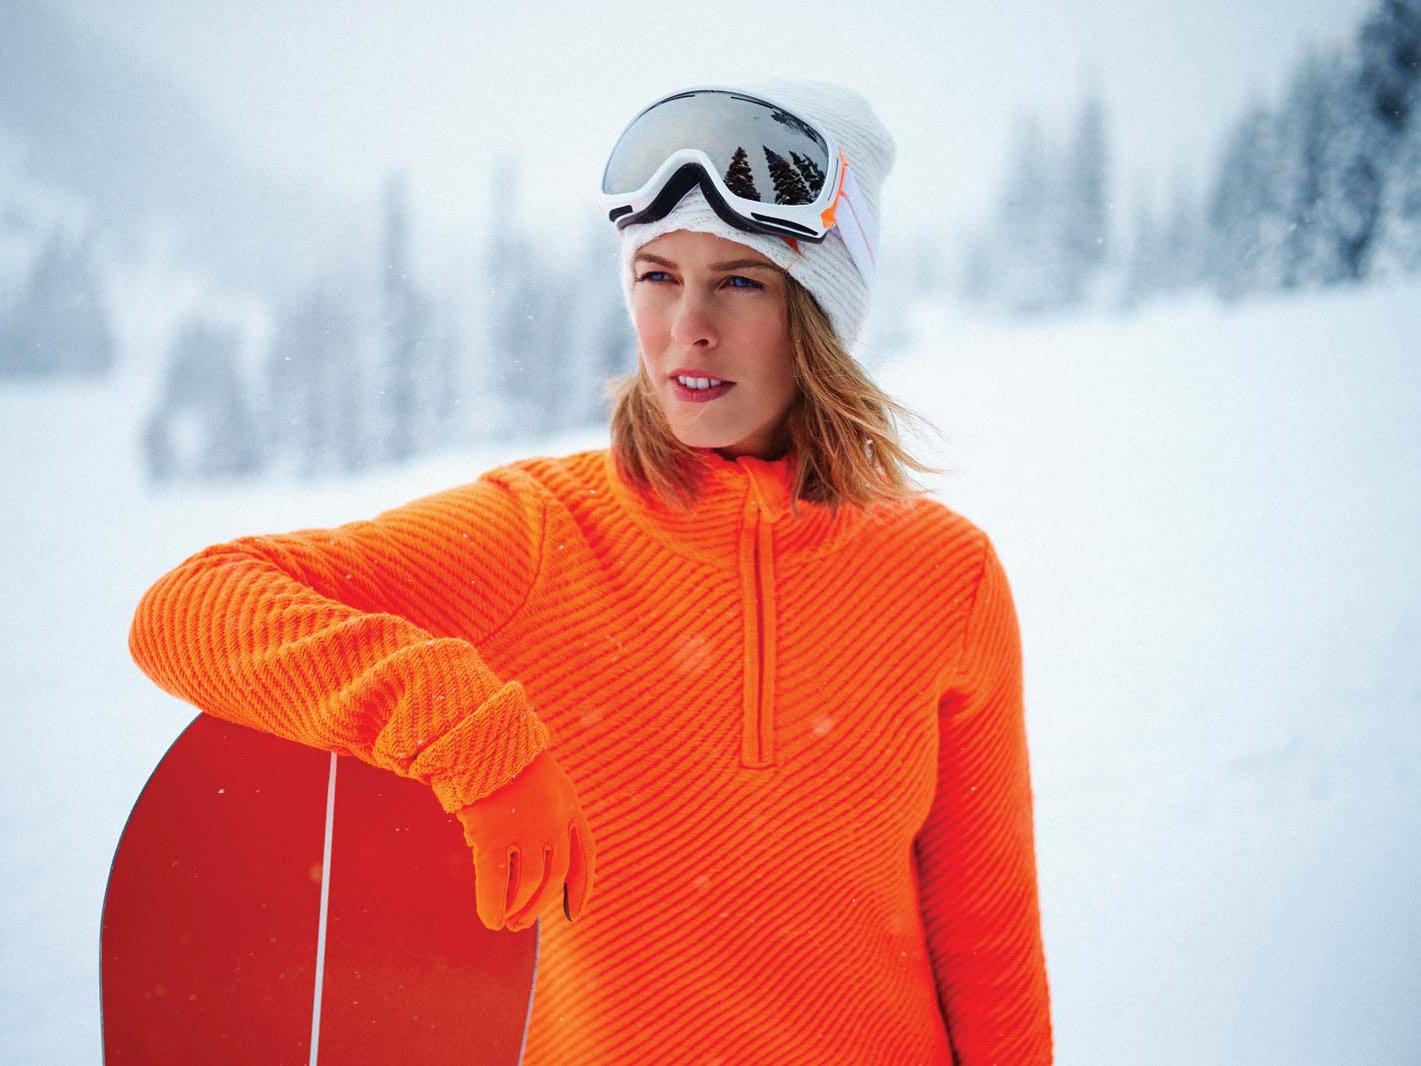 Torah Bright snowboarding